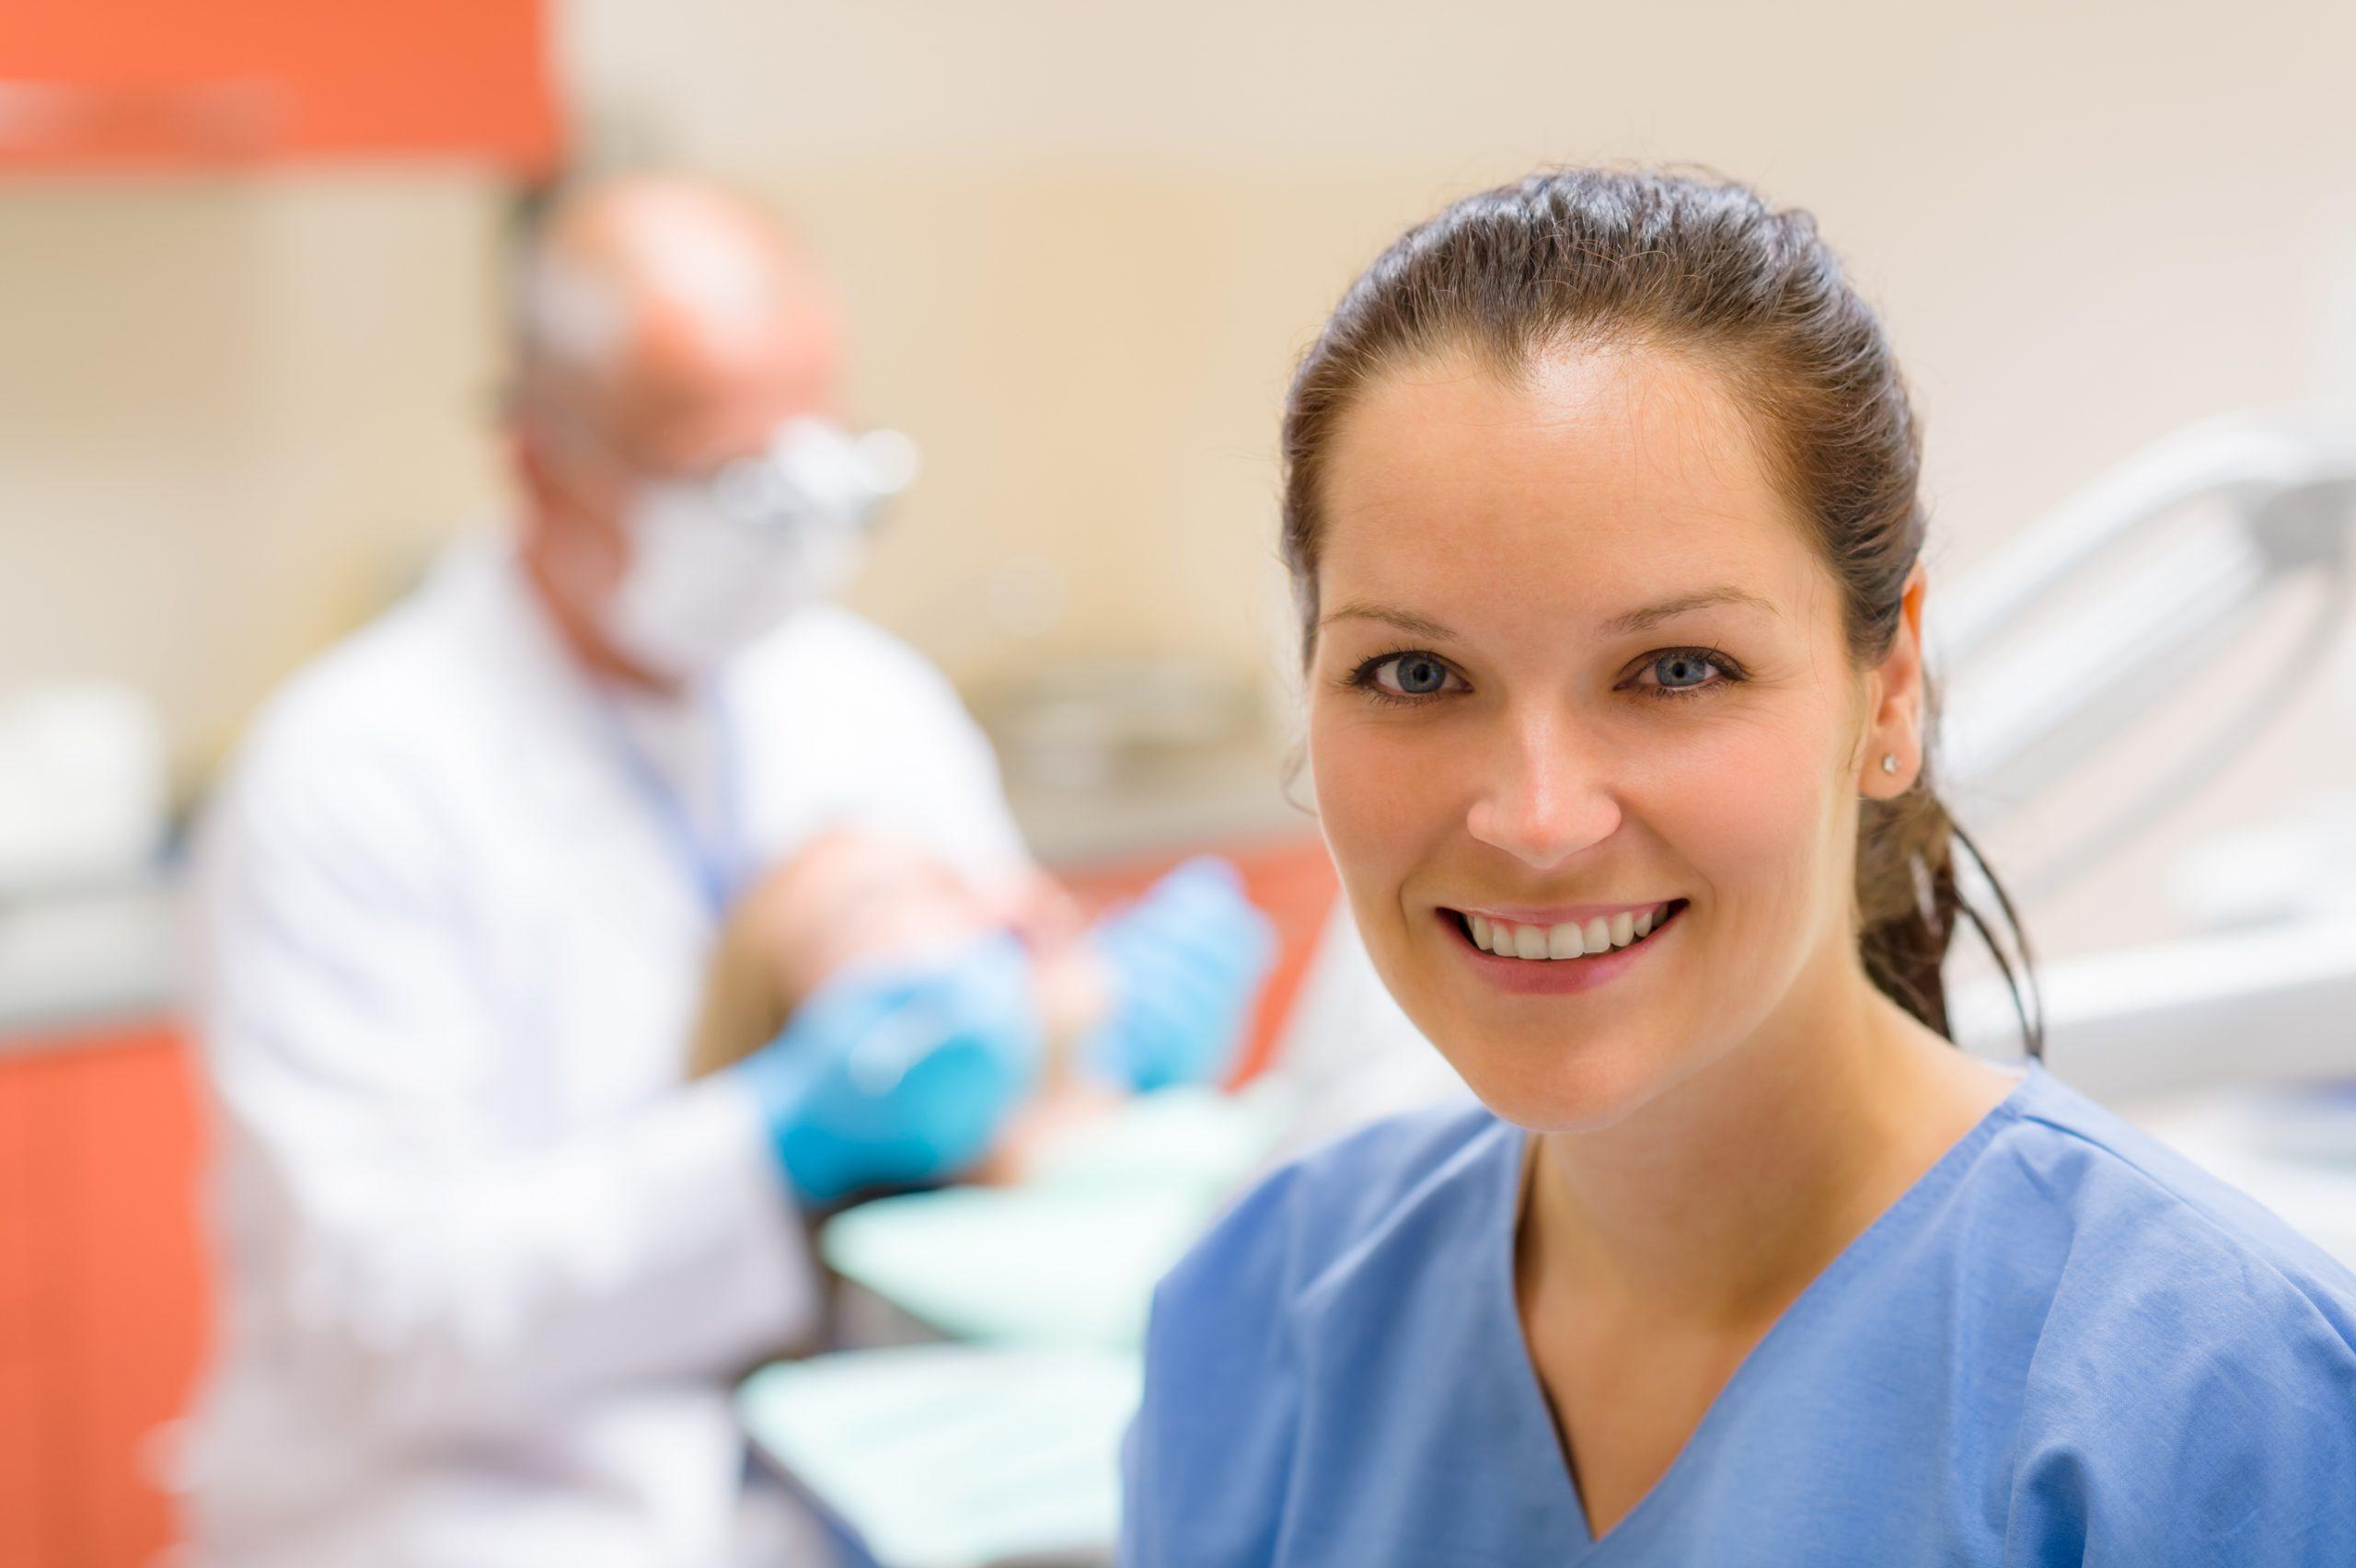 dental hygienist attorney